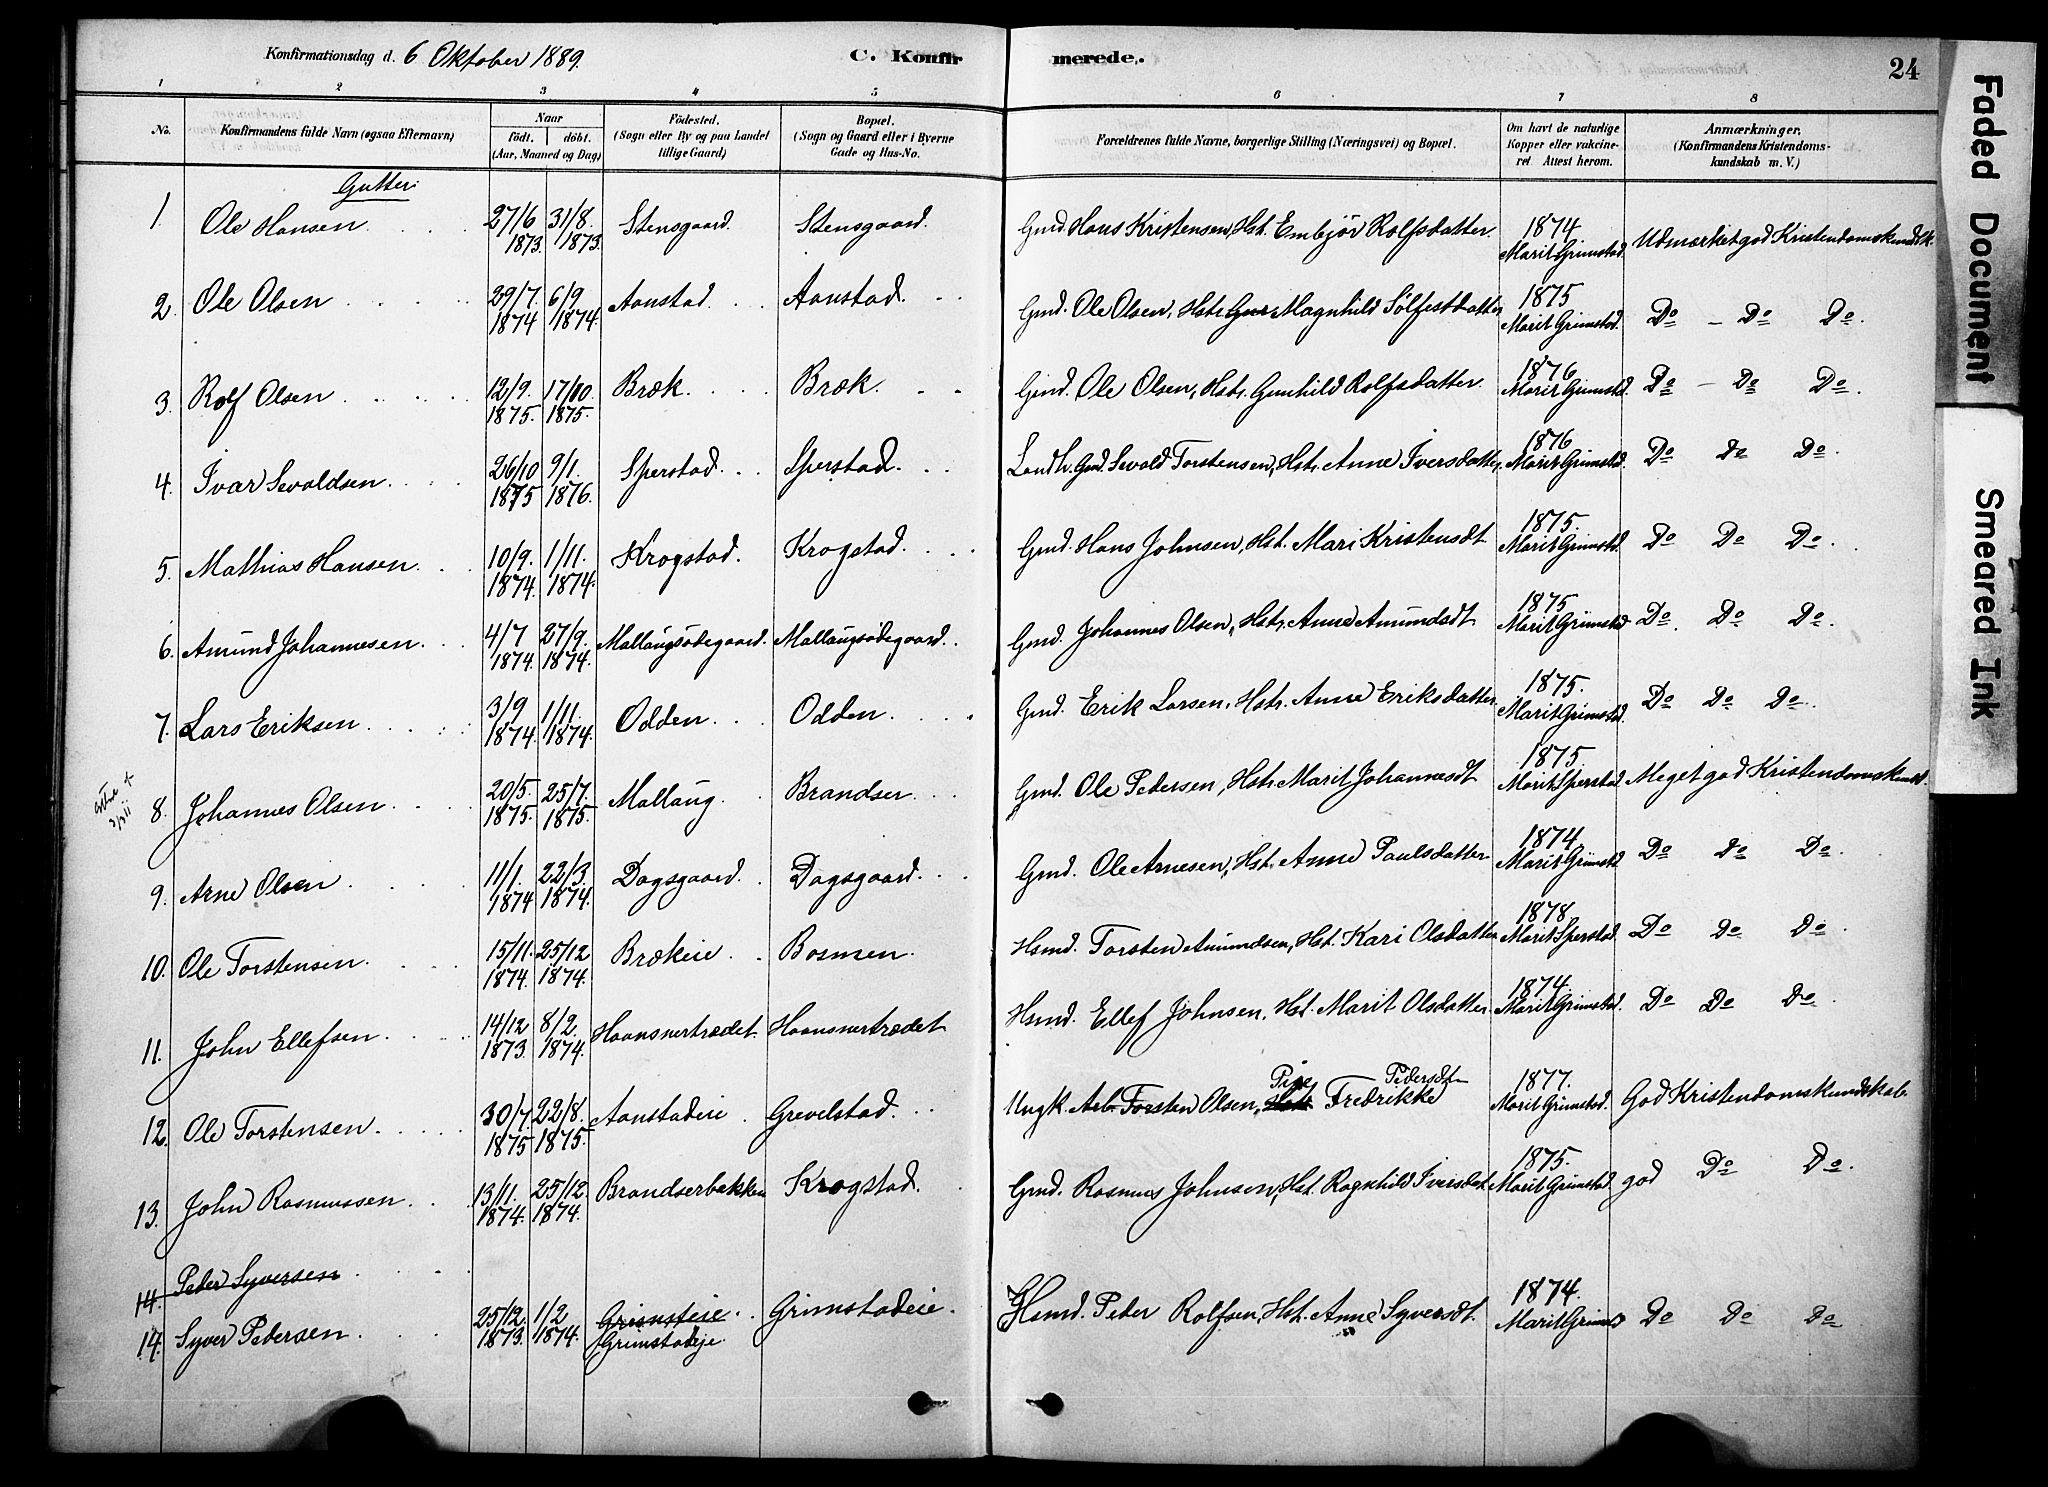 SAH, Skjåk prestekontor, Ministerialbok nr. 2, 1878-1907, s. 24